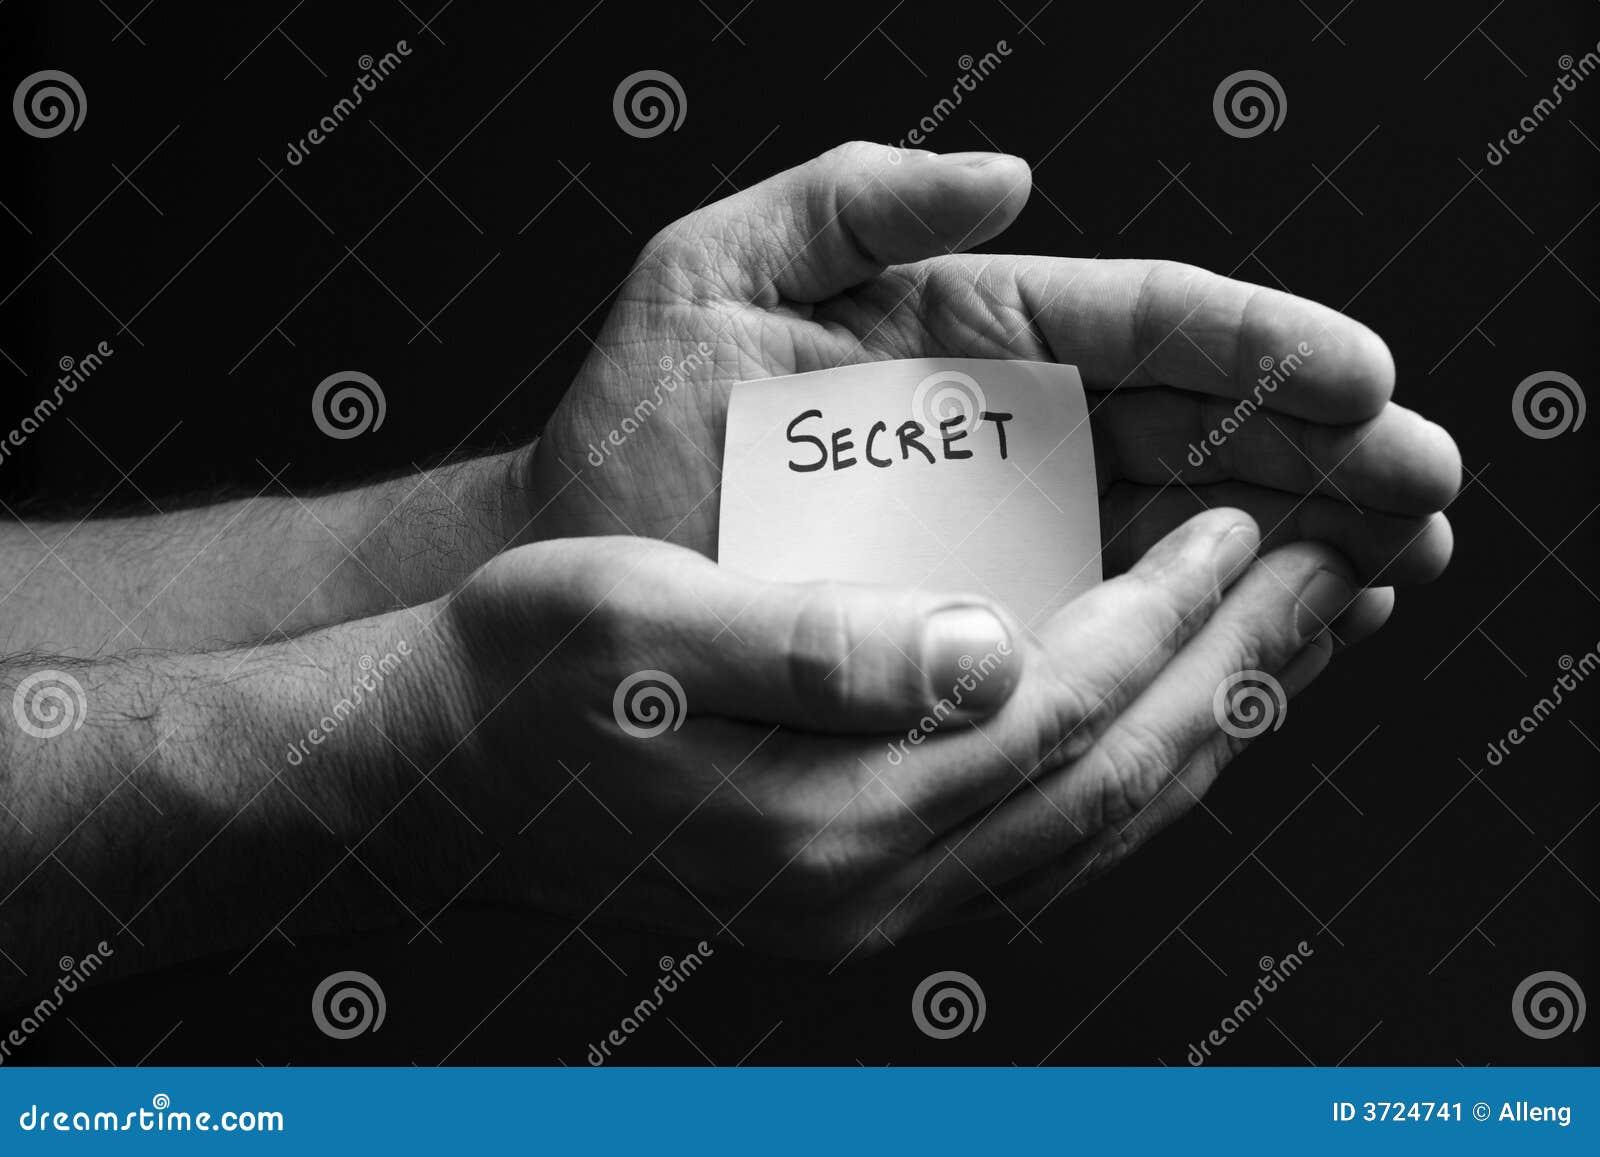 Handgeheimnis